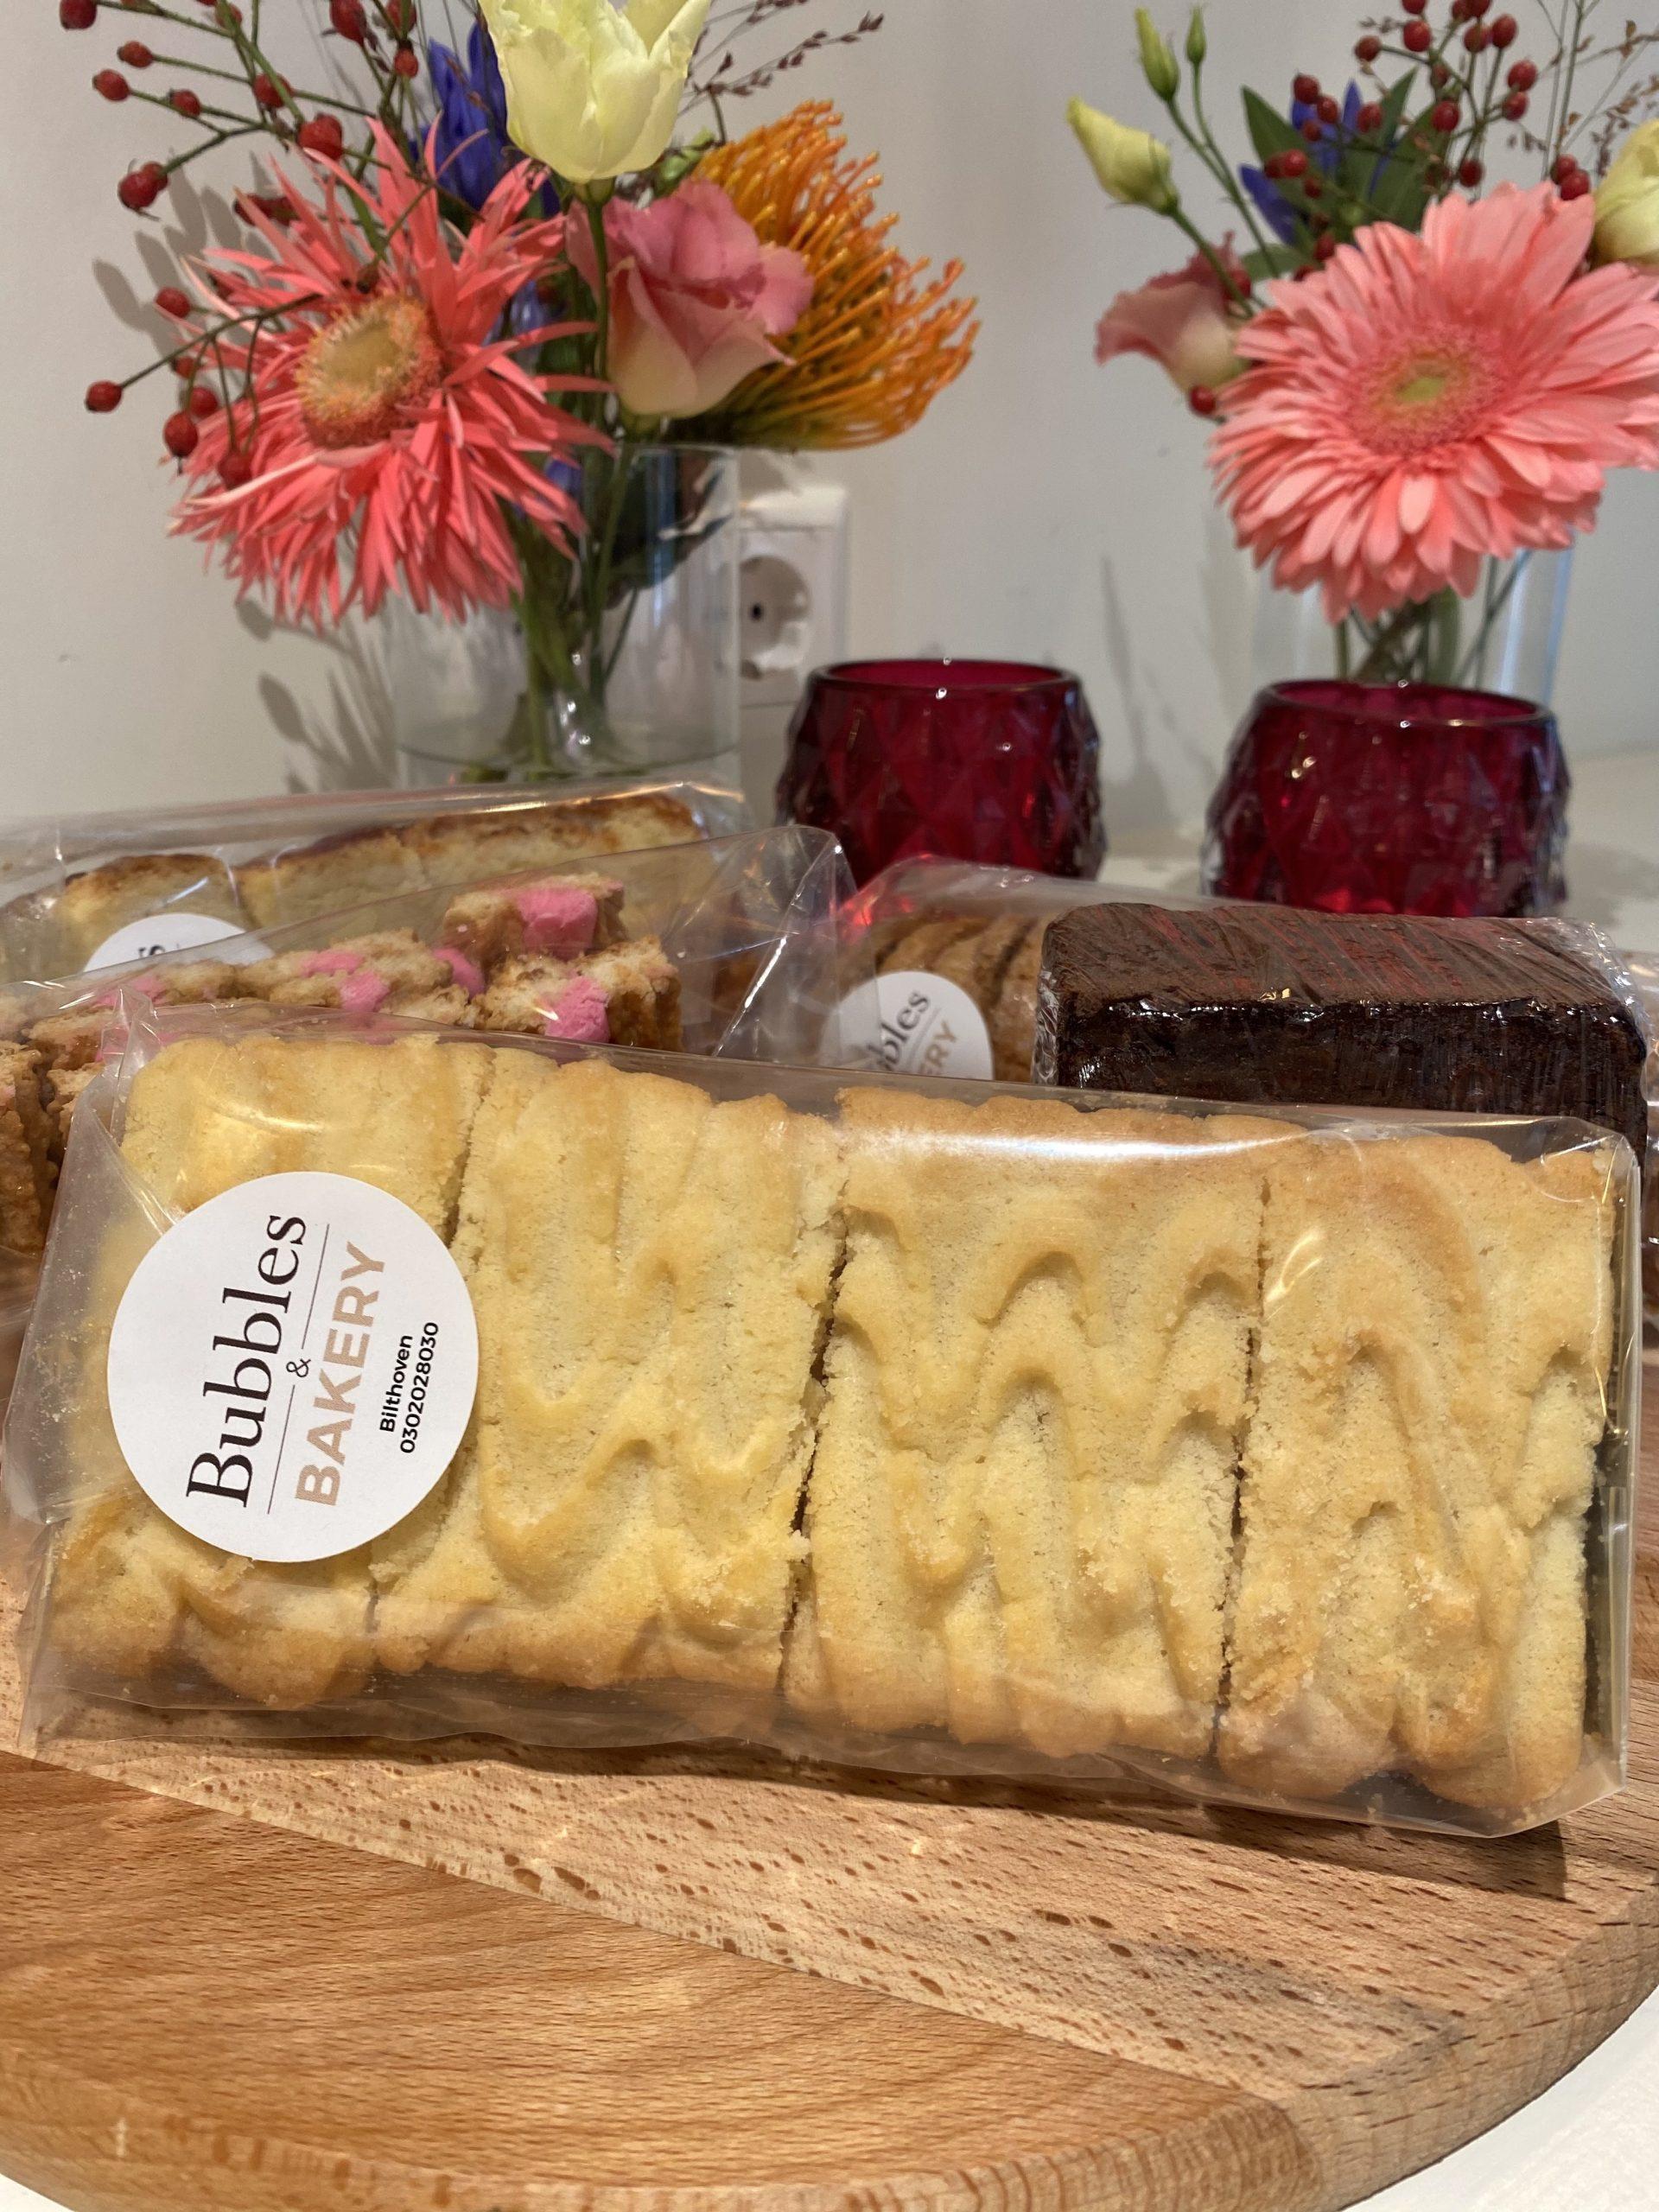 Spritsen koekjes van Bubbles & Bakery Bilthoven